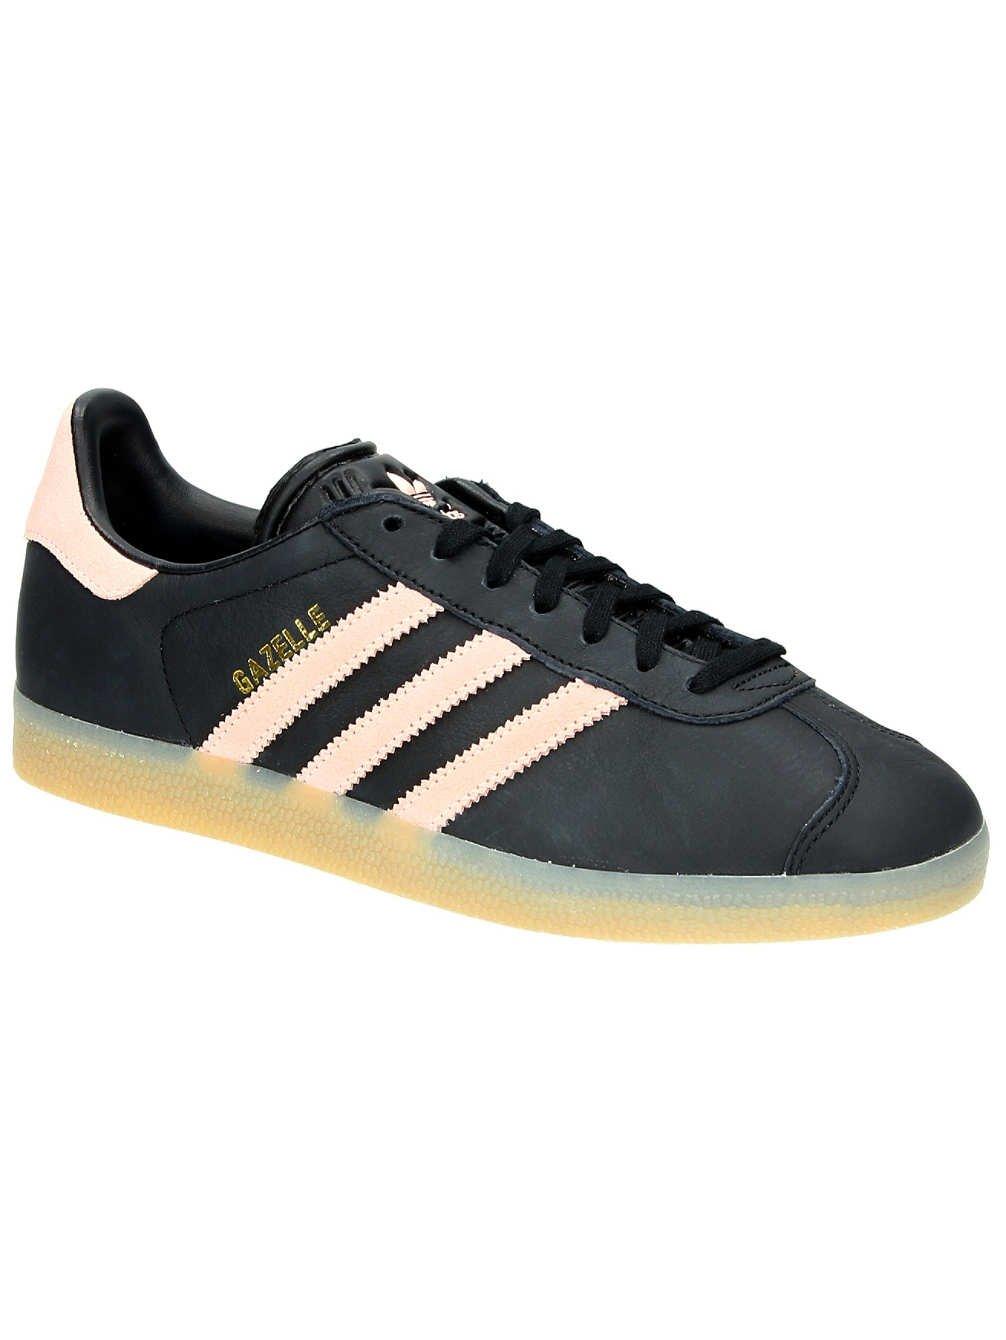 adidas Damen Gazelle Pumps  *|Black|multi